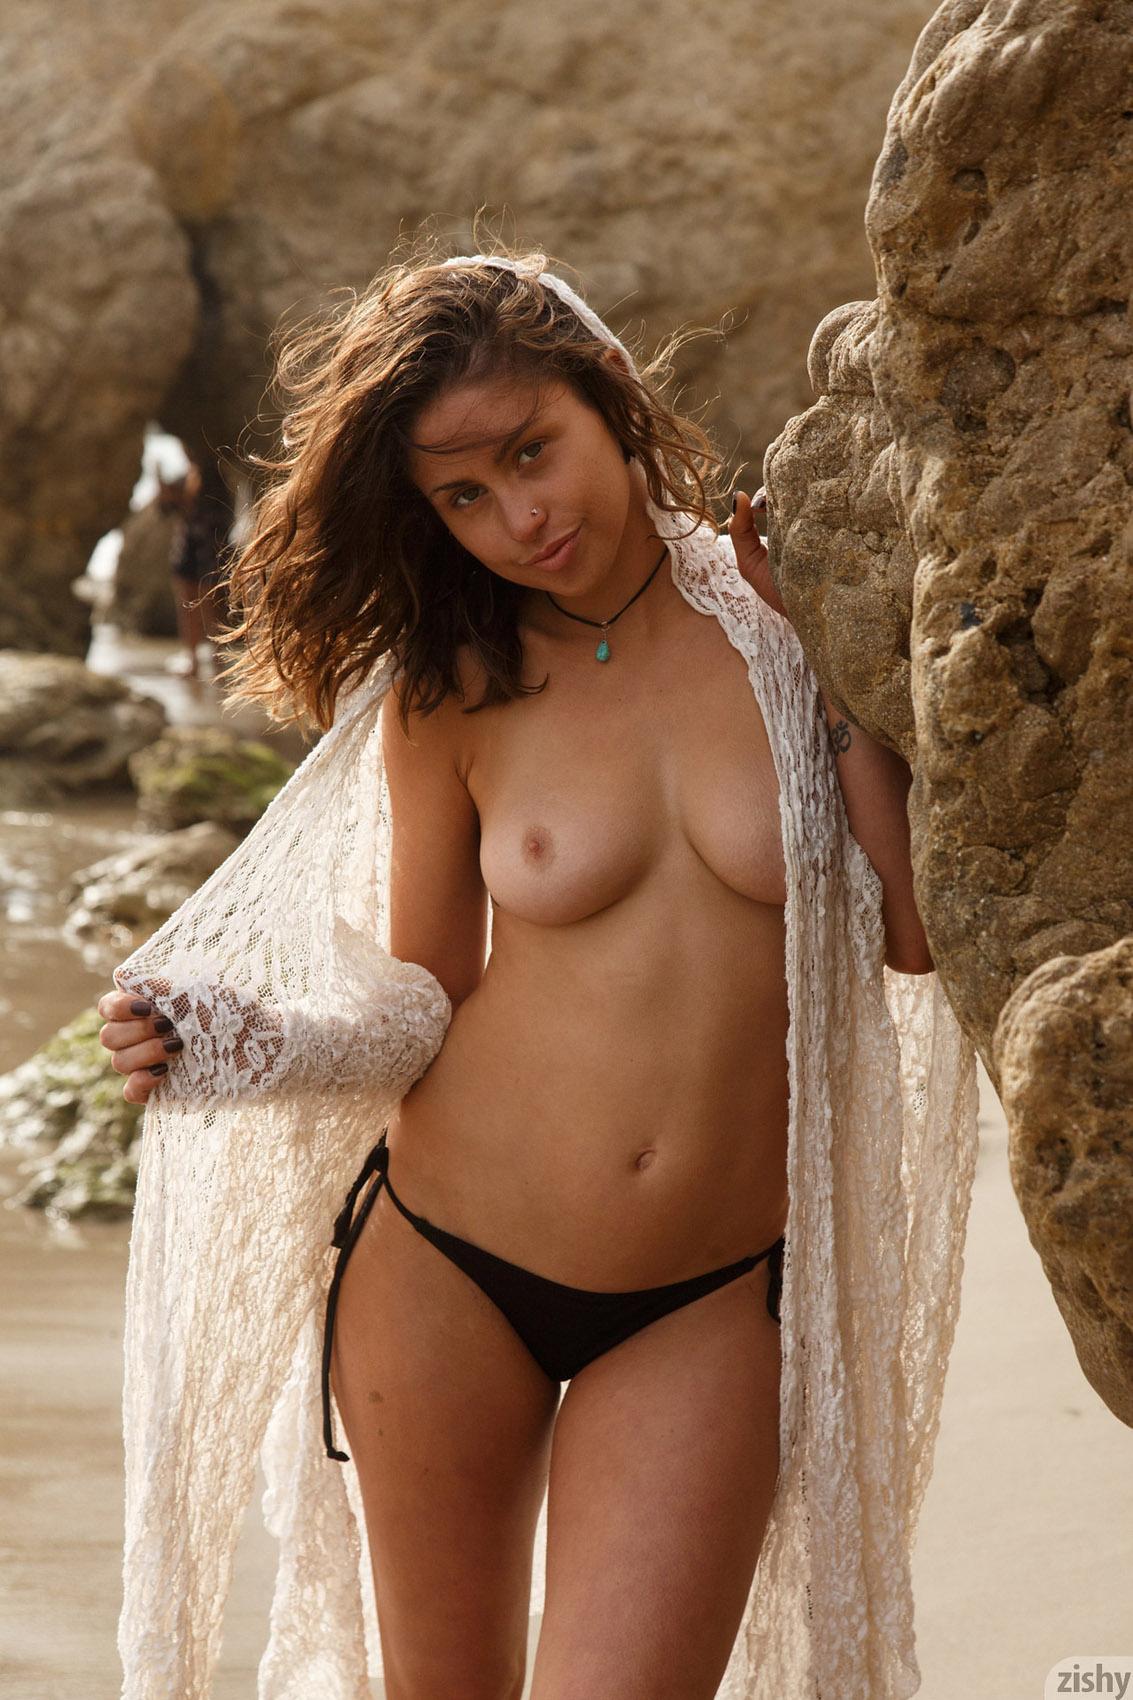 Angela Bassett Ancensored sonya cassidy actress hot -